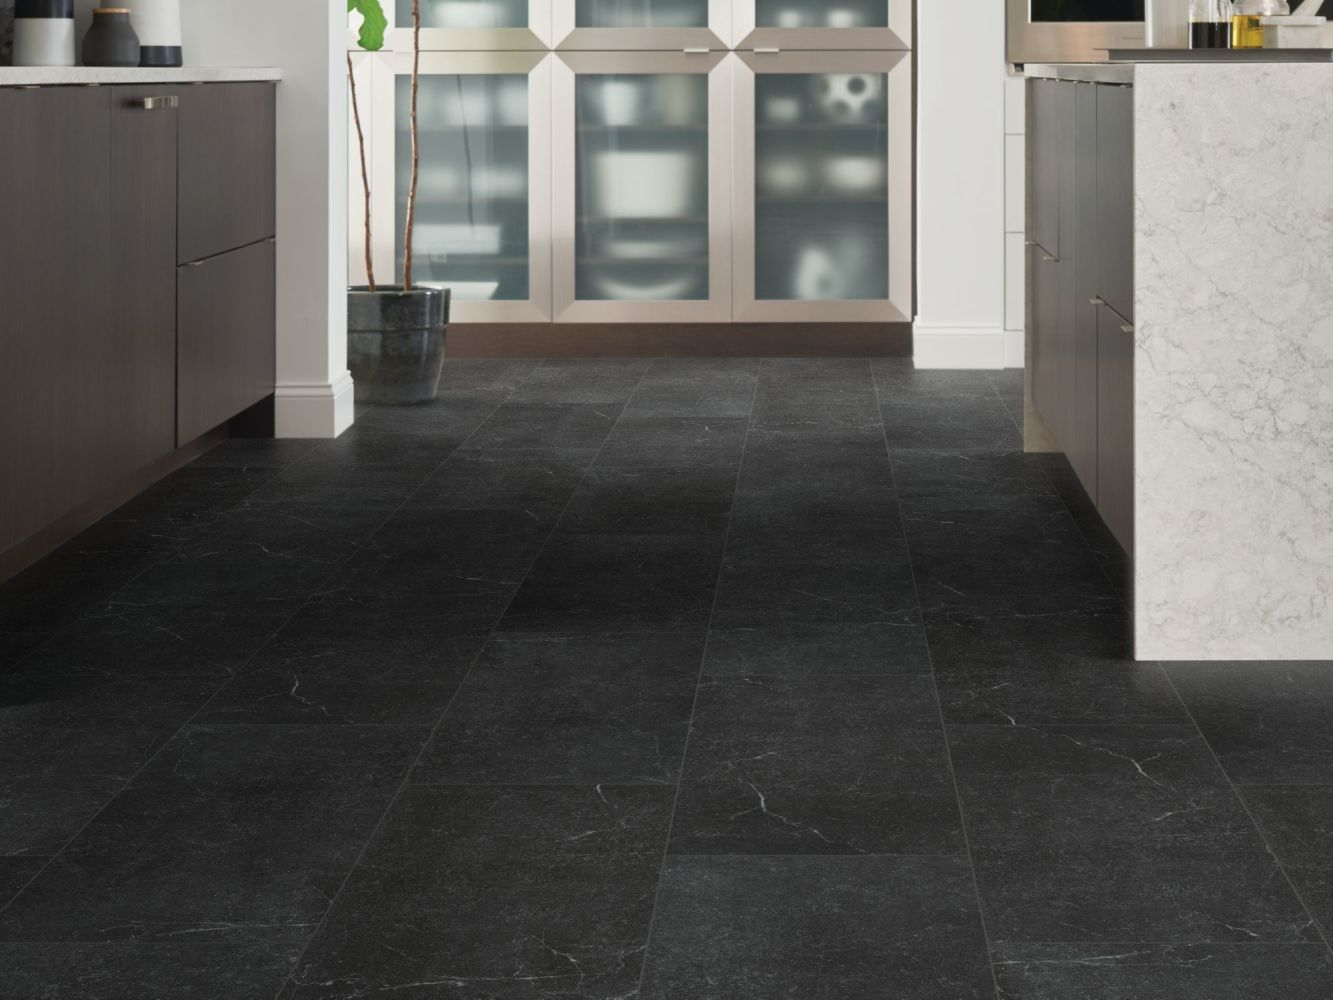 Shaw Floors Resilient Property Solutions Urban Organics Smoke 00914_VE280